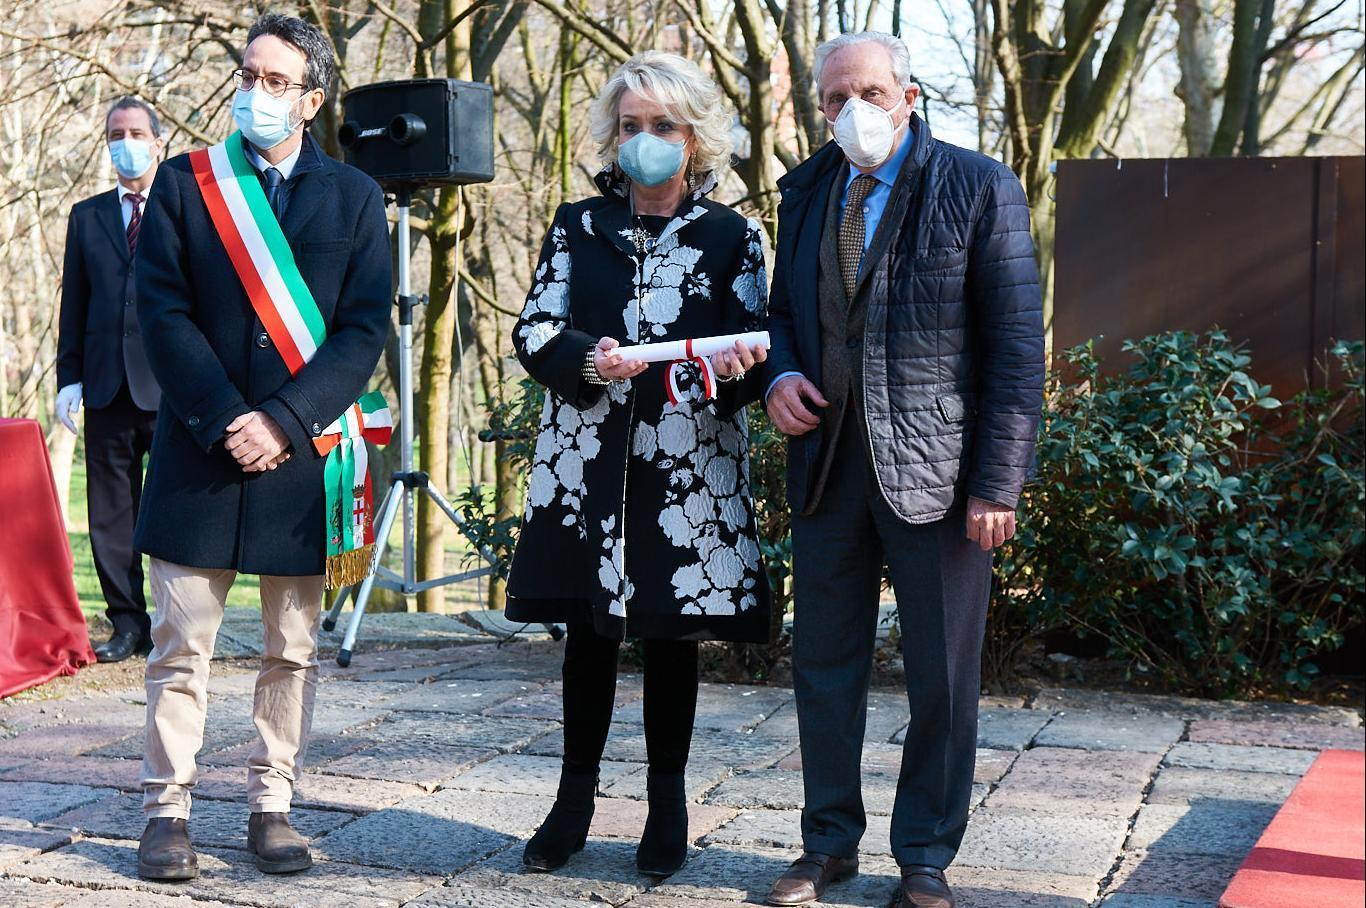 Lamberto Bertolé with Mario Iavarone and Daniela Iavarone, proponents of the Righteous candidacy of Giorgio Paglia and Cicci Vandone